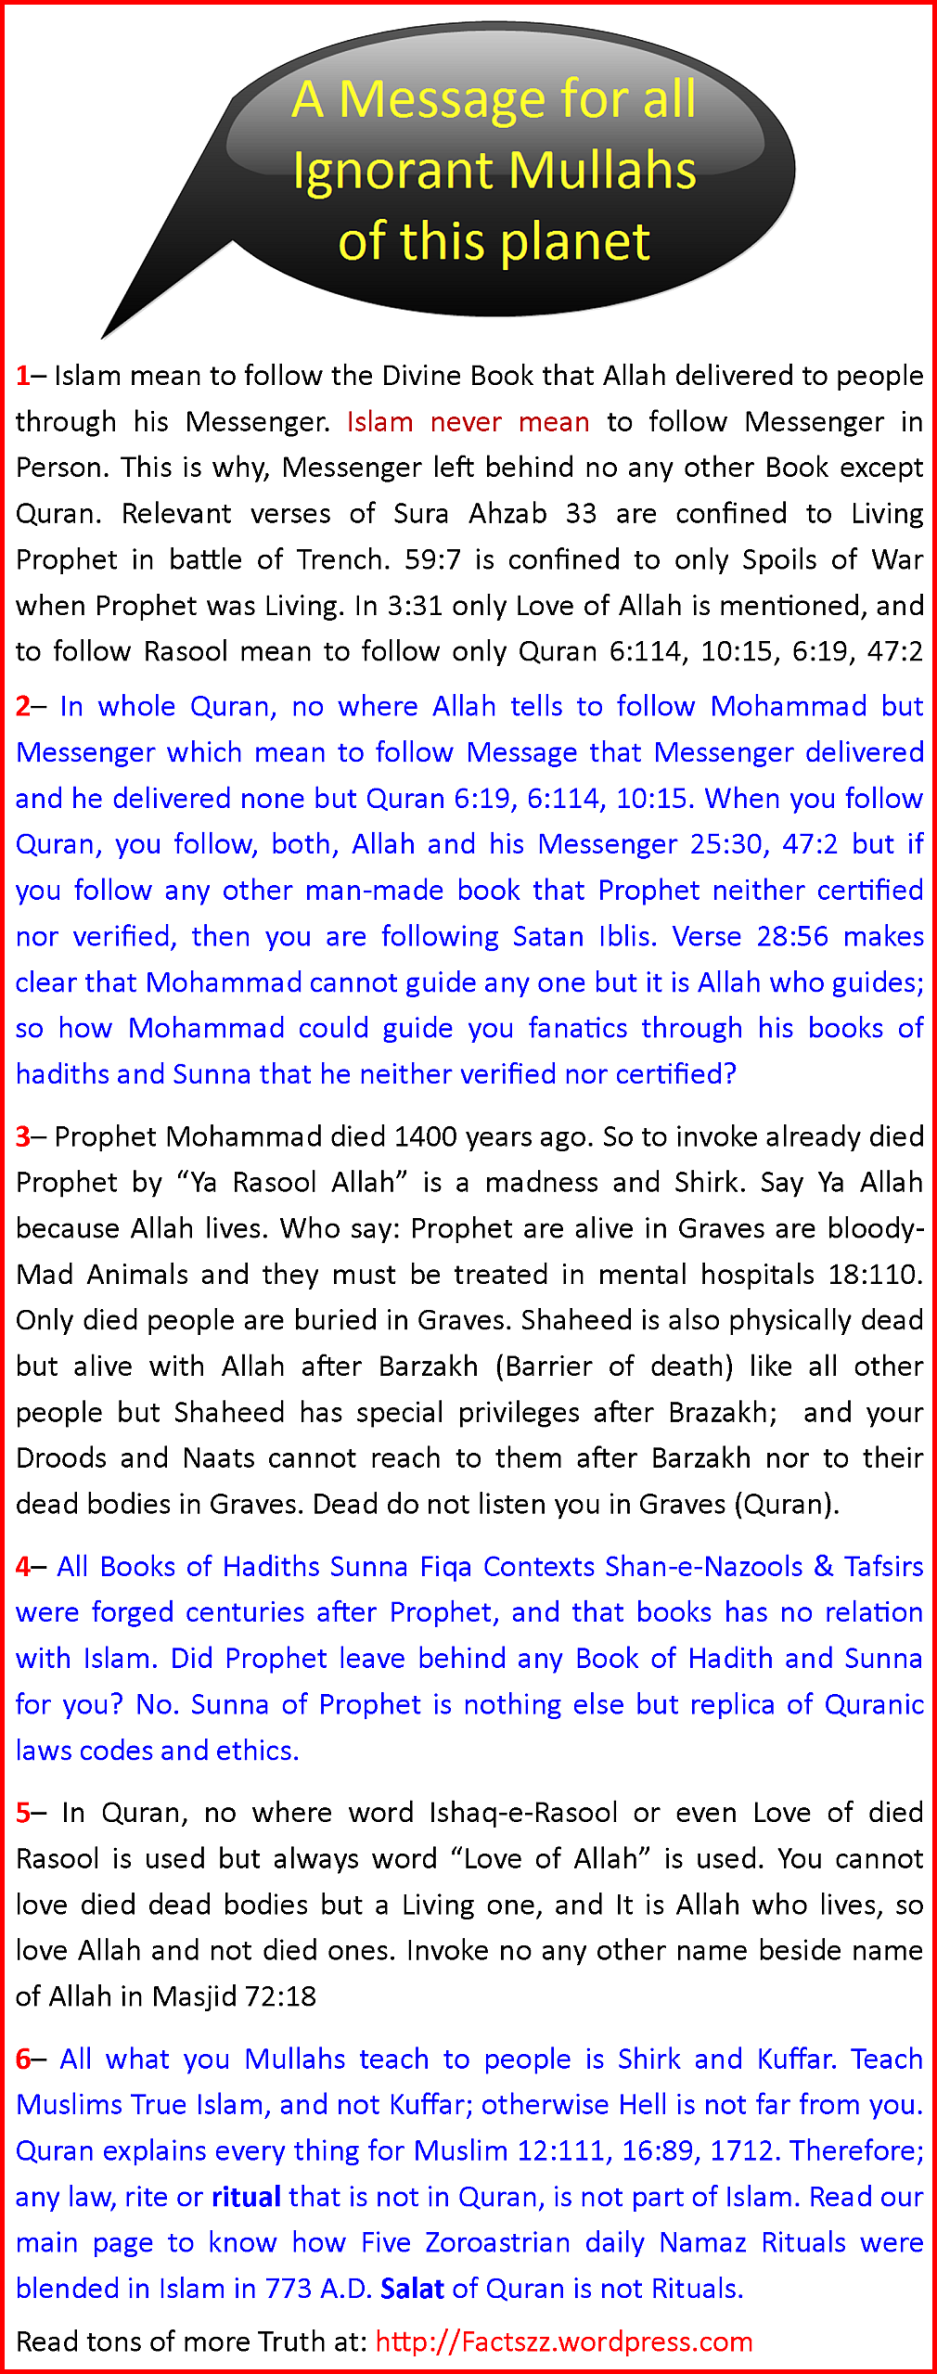 MessageForJahilMullahs2